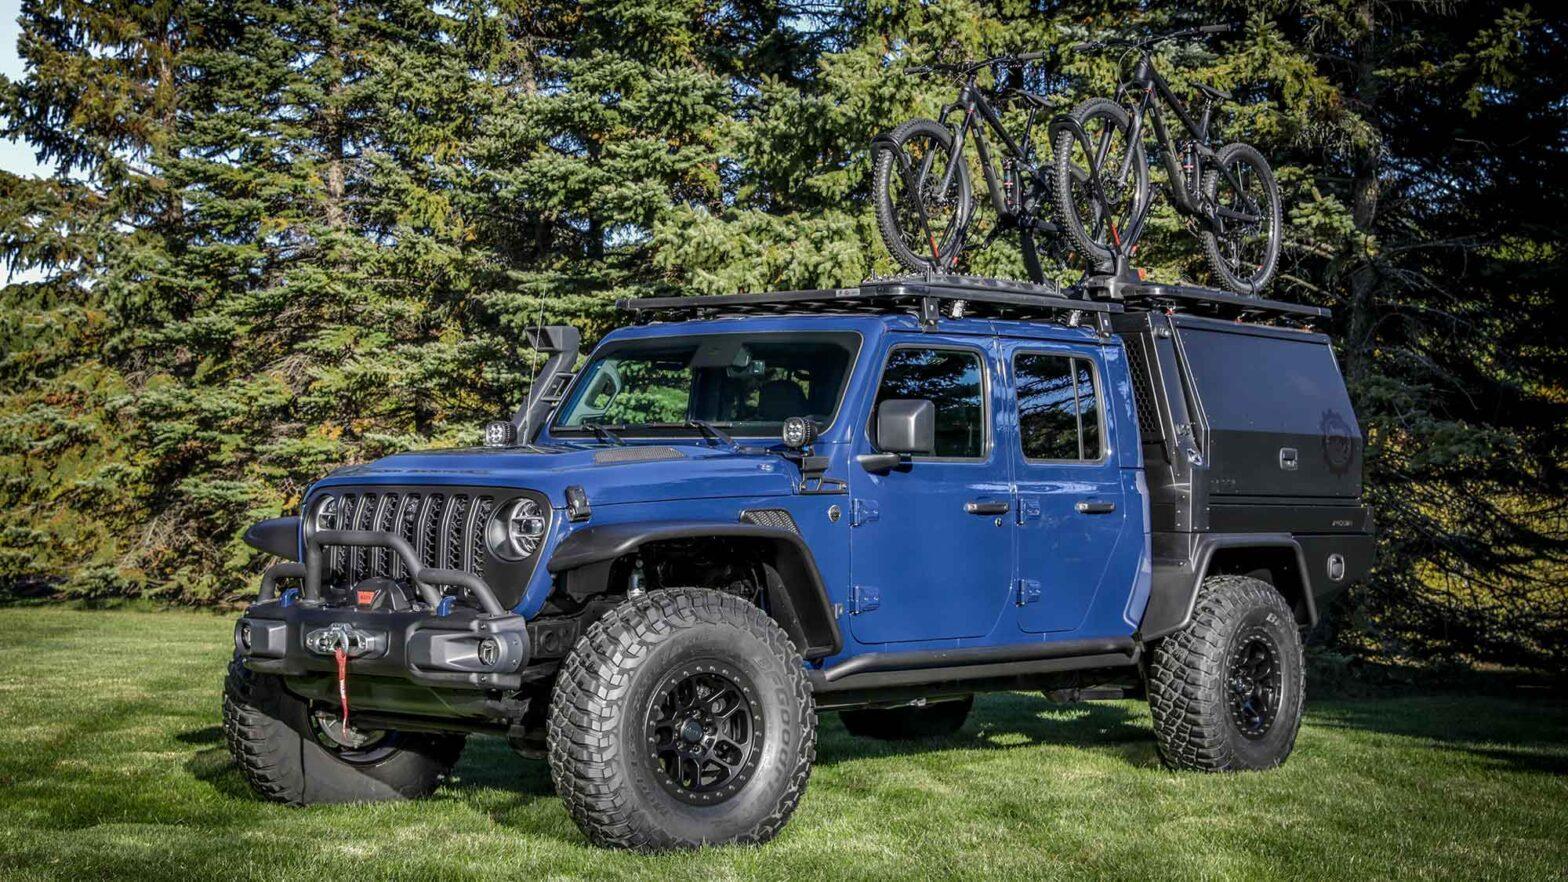 Mopar Jeep Gladiator Top Dog Concept Truck